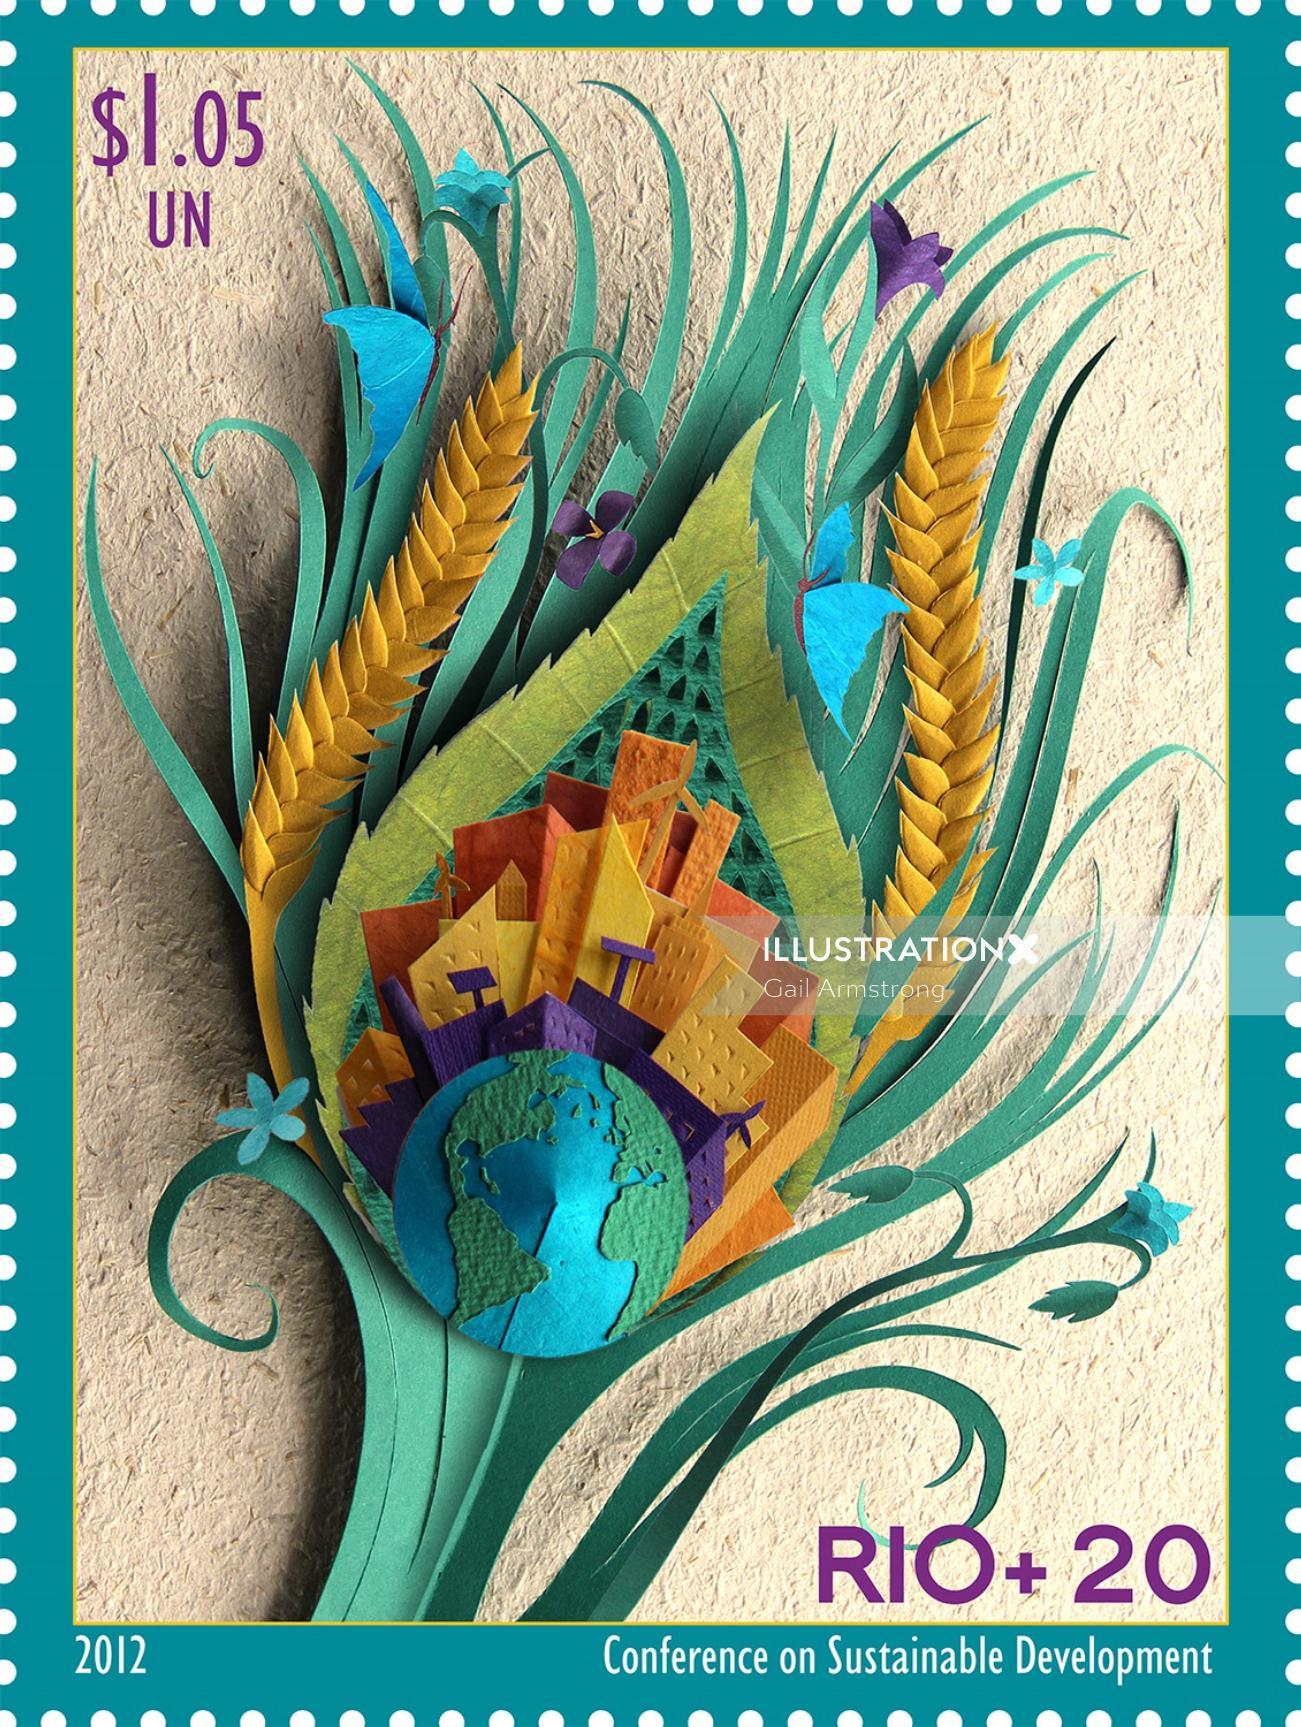 peacock feather illustrating sustainable development